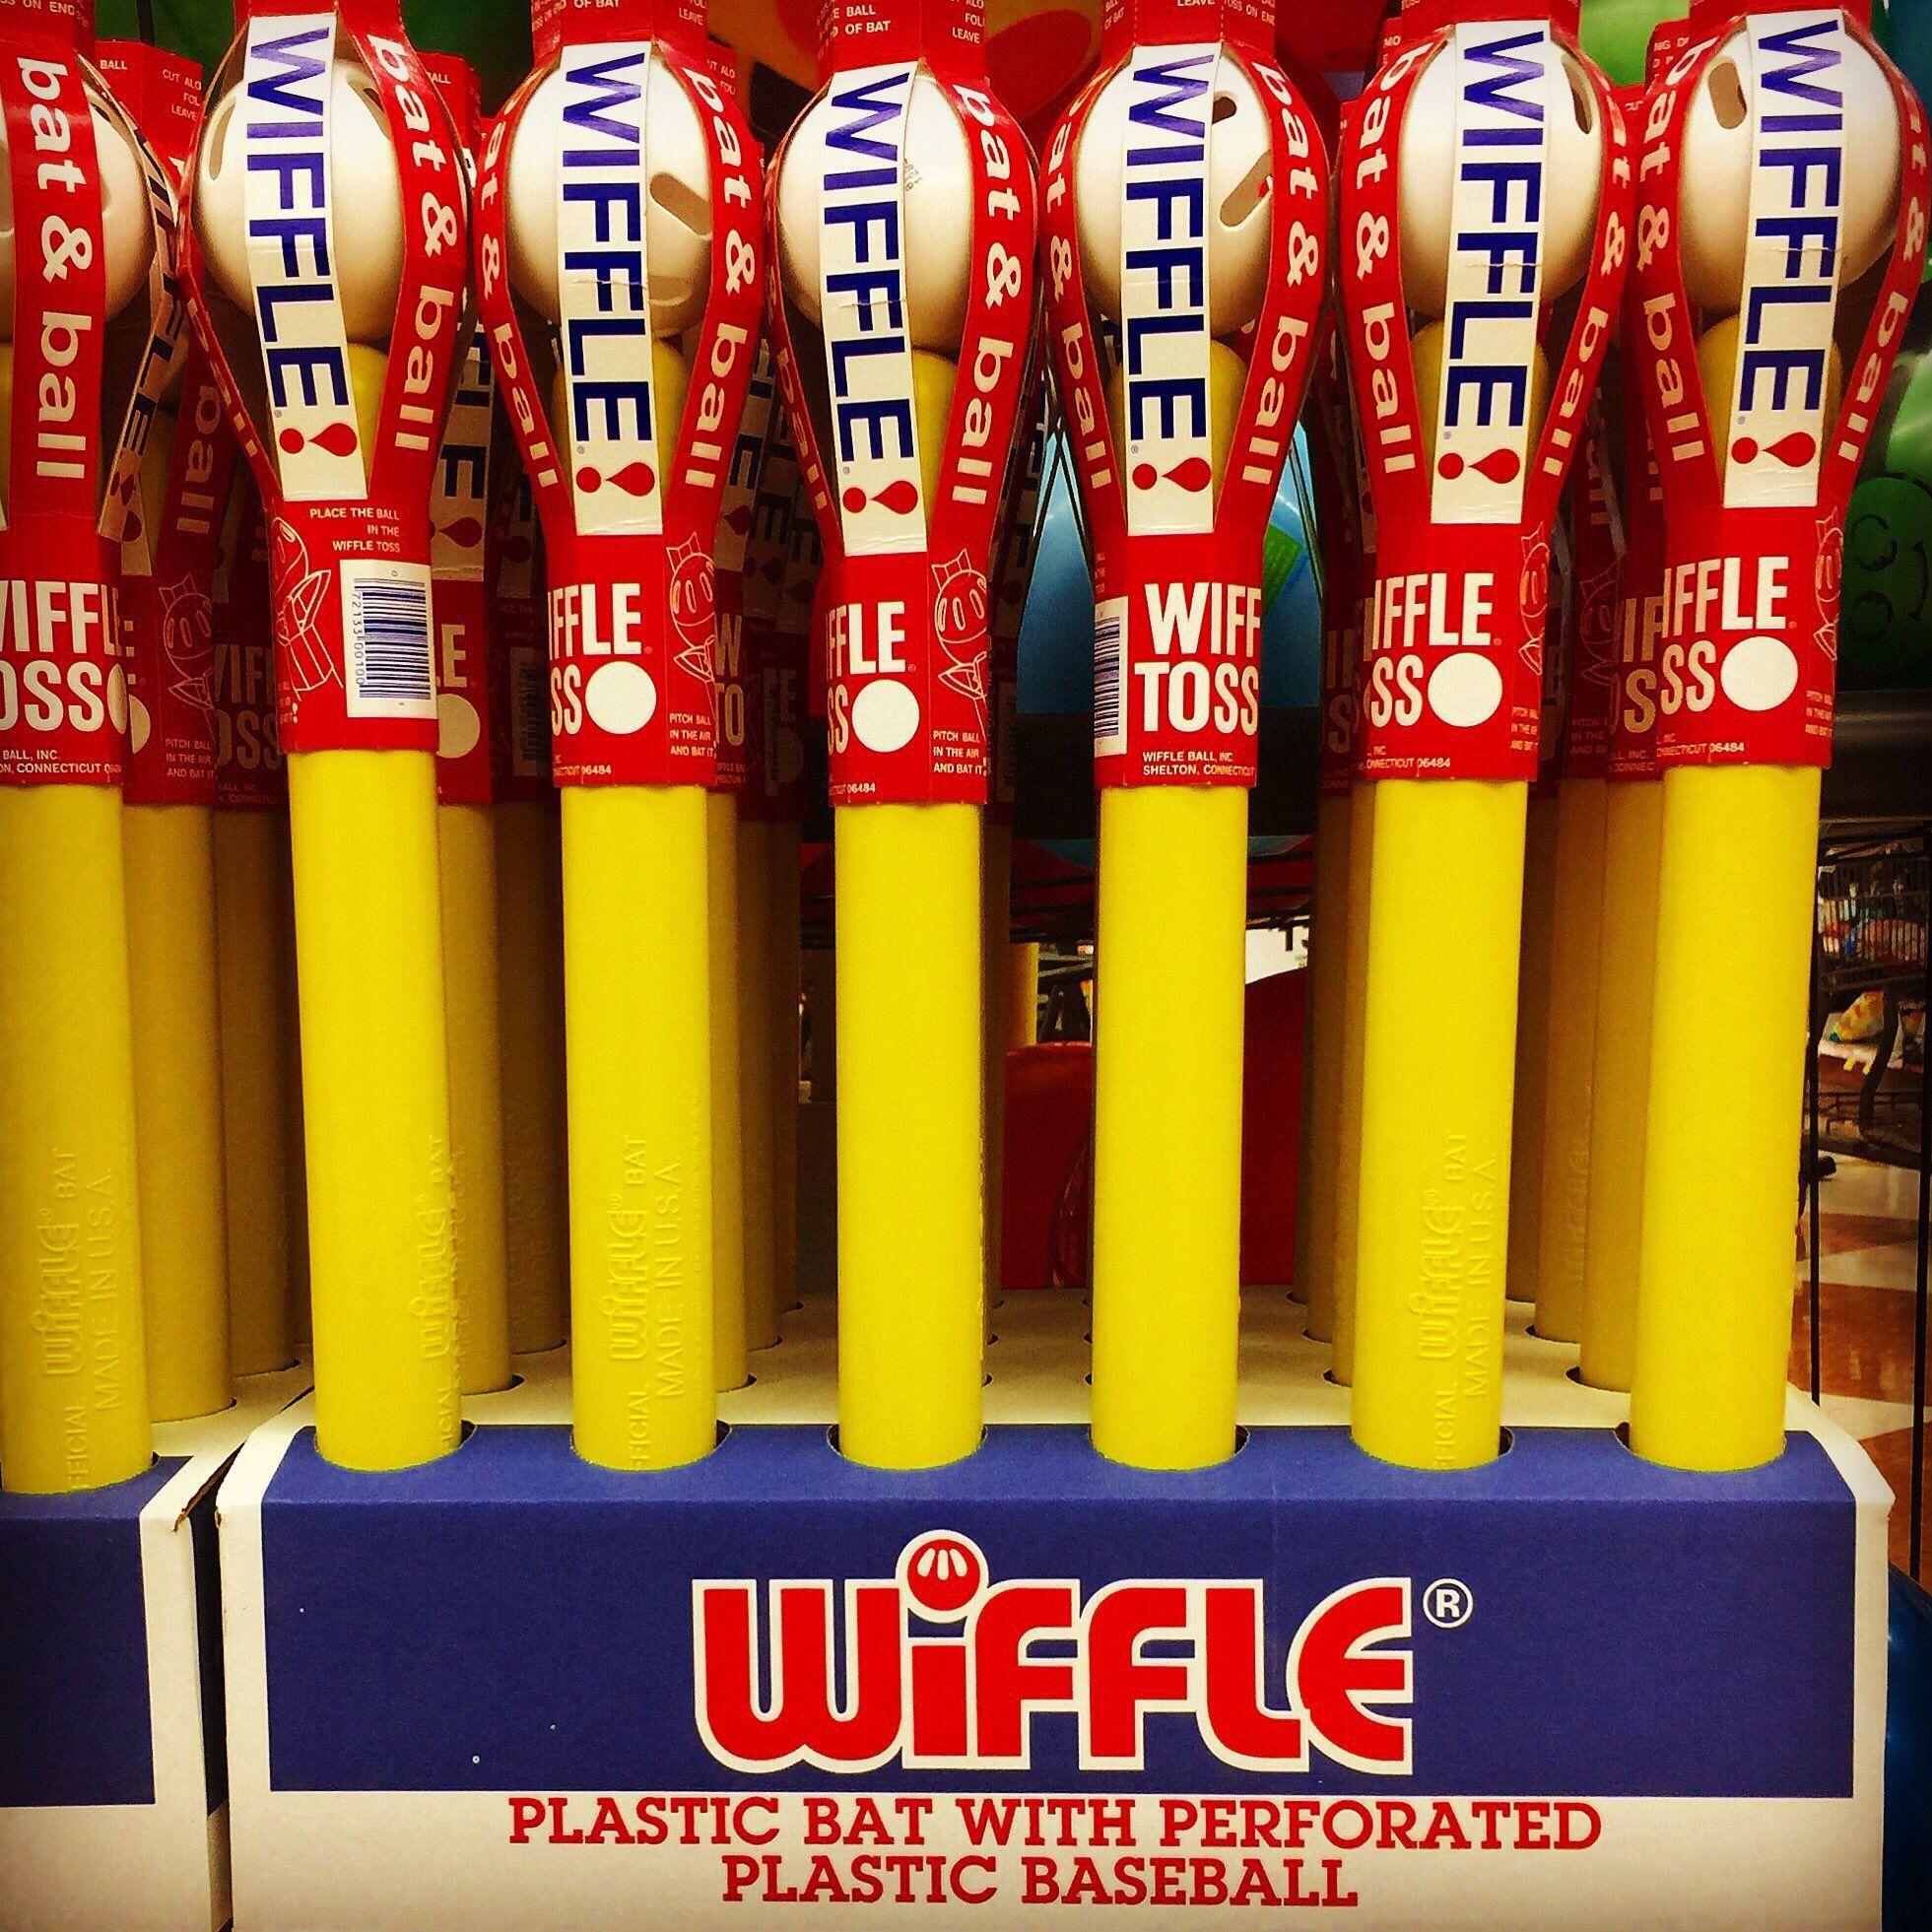 WIFFLE® Ball! #Wiffle #Wiffleball #Wiffleballinc